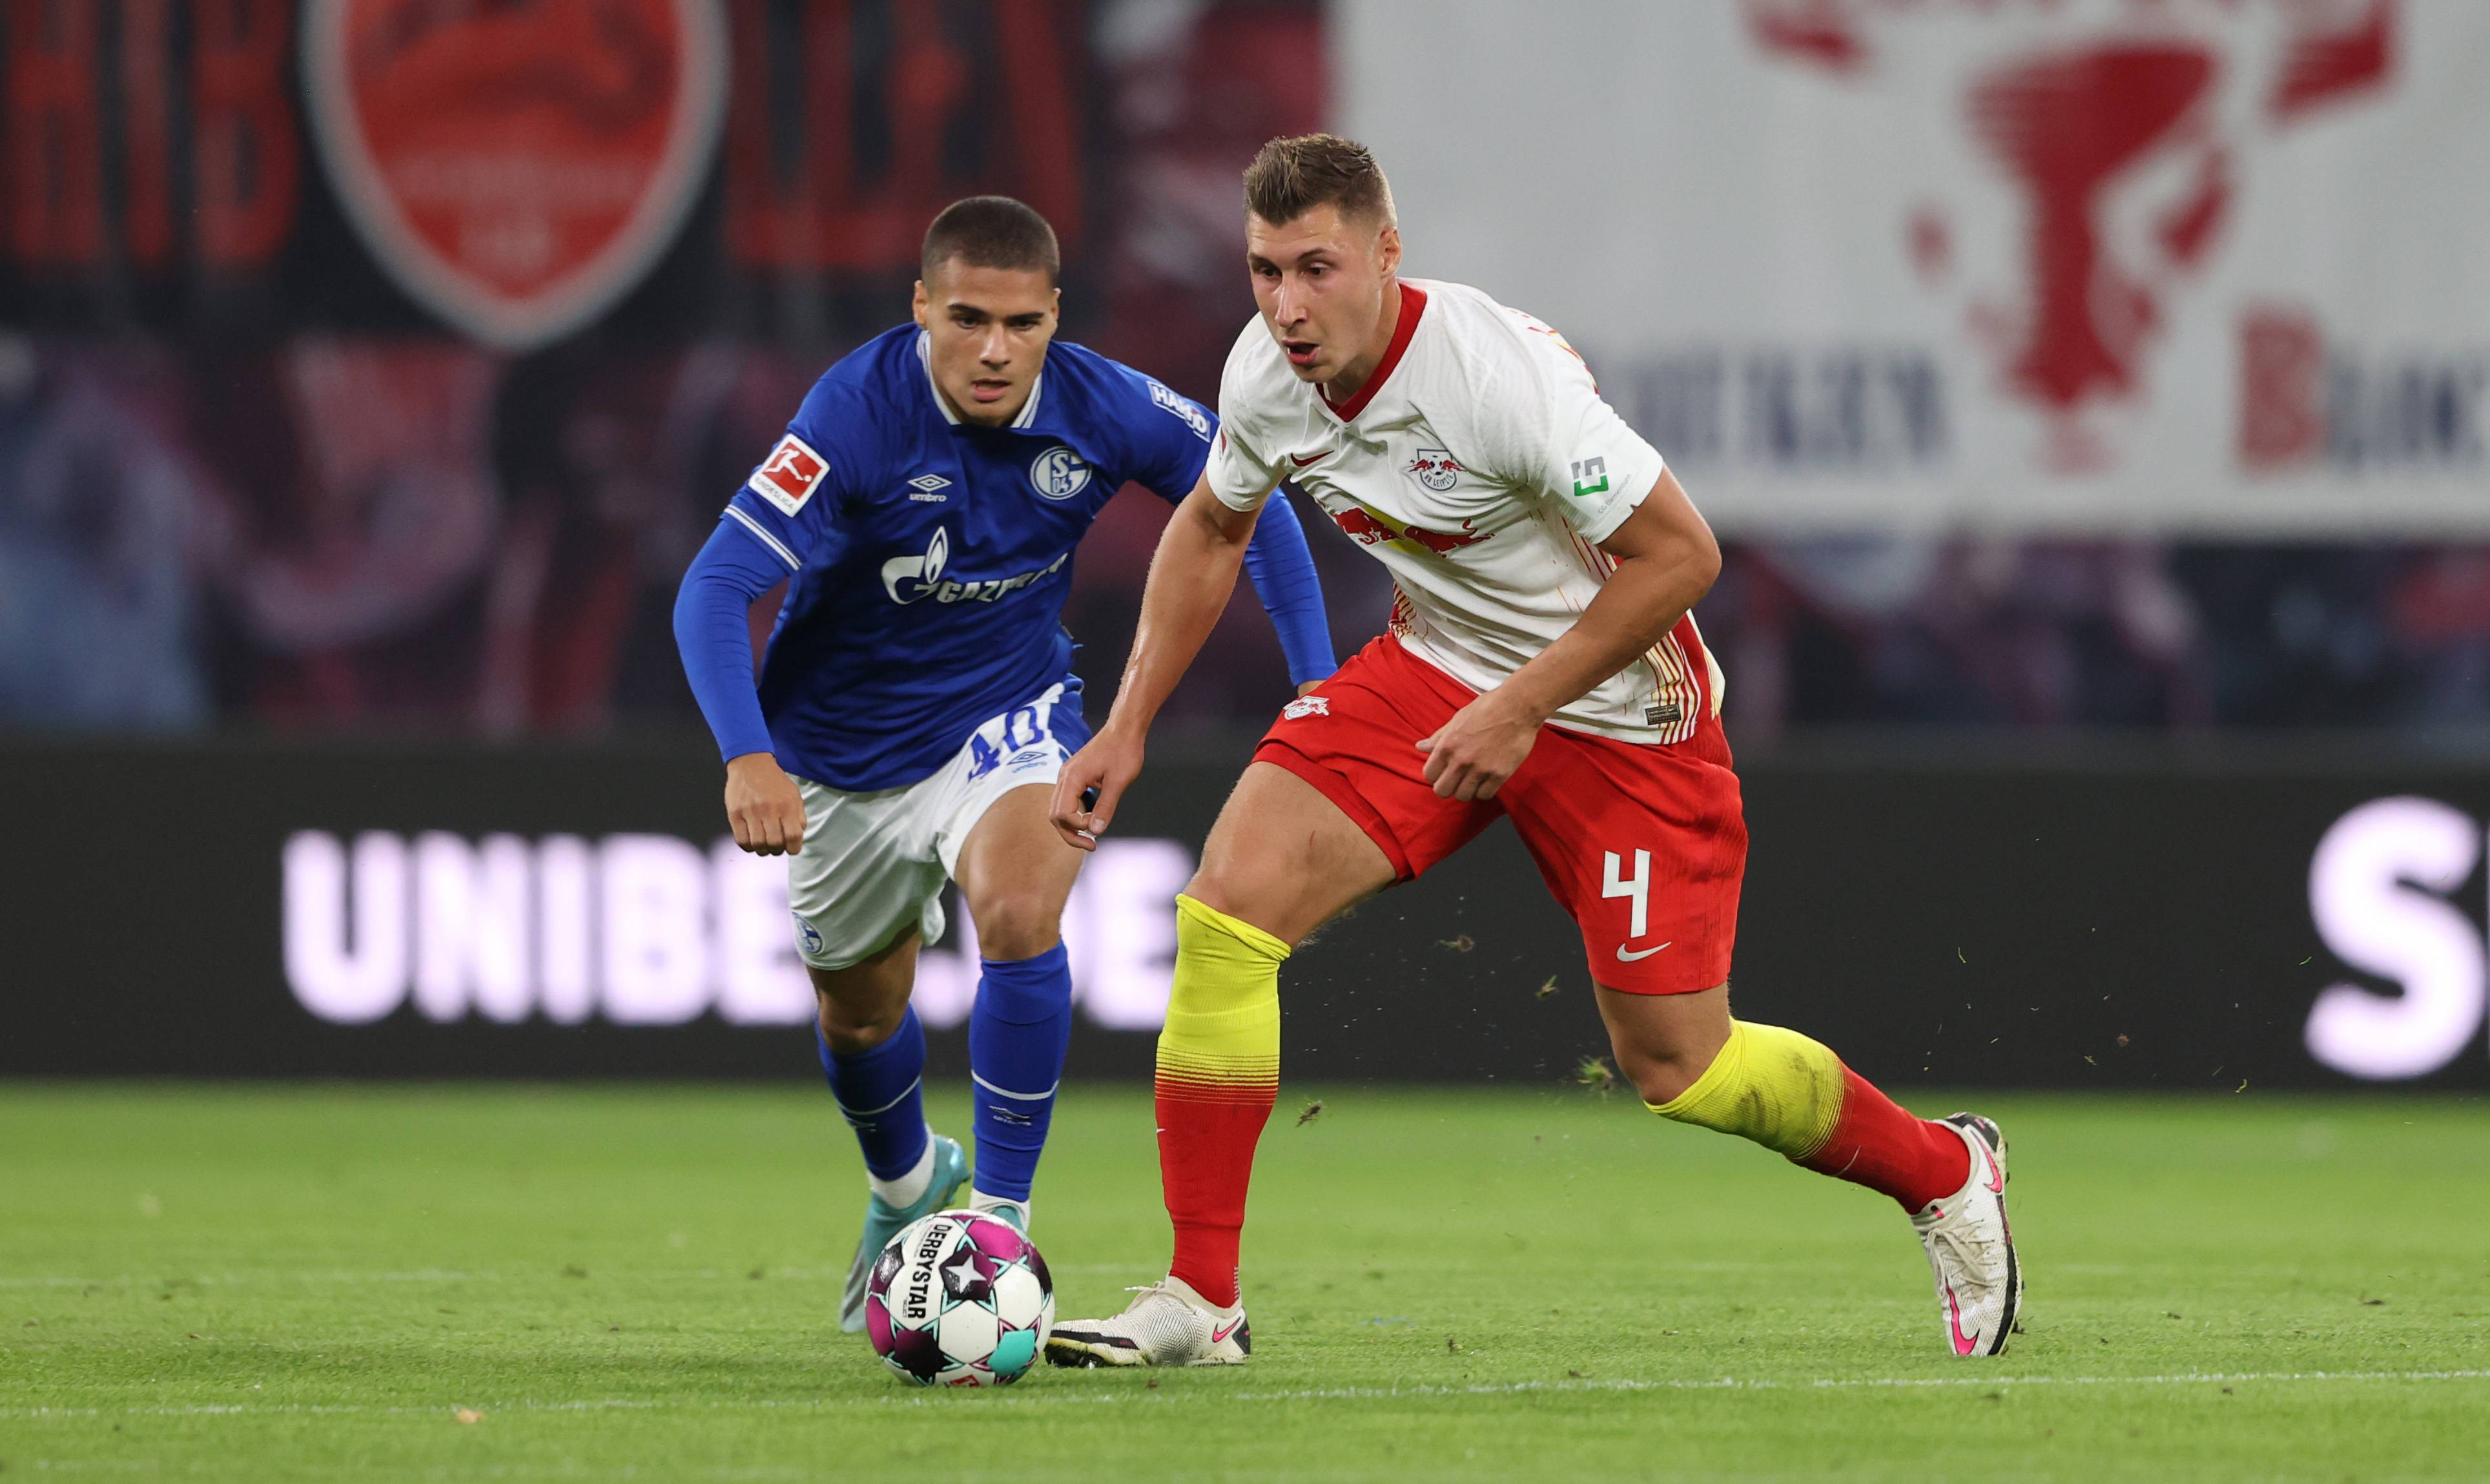 Dazn Schalke